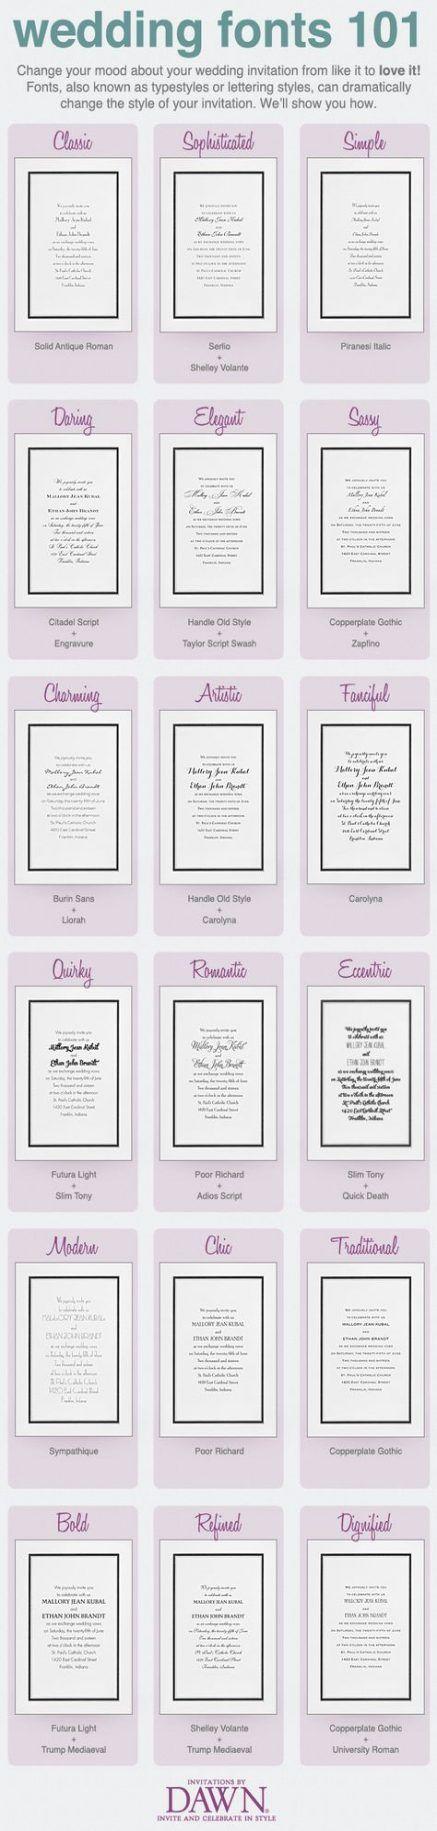 Wedding invitations silver simple 63 Best ideas | Wedding invitation fonts,  Invitation fonts, Vintage wedding invitations